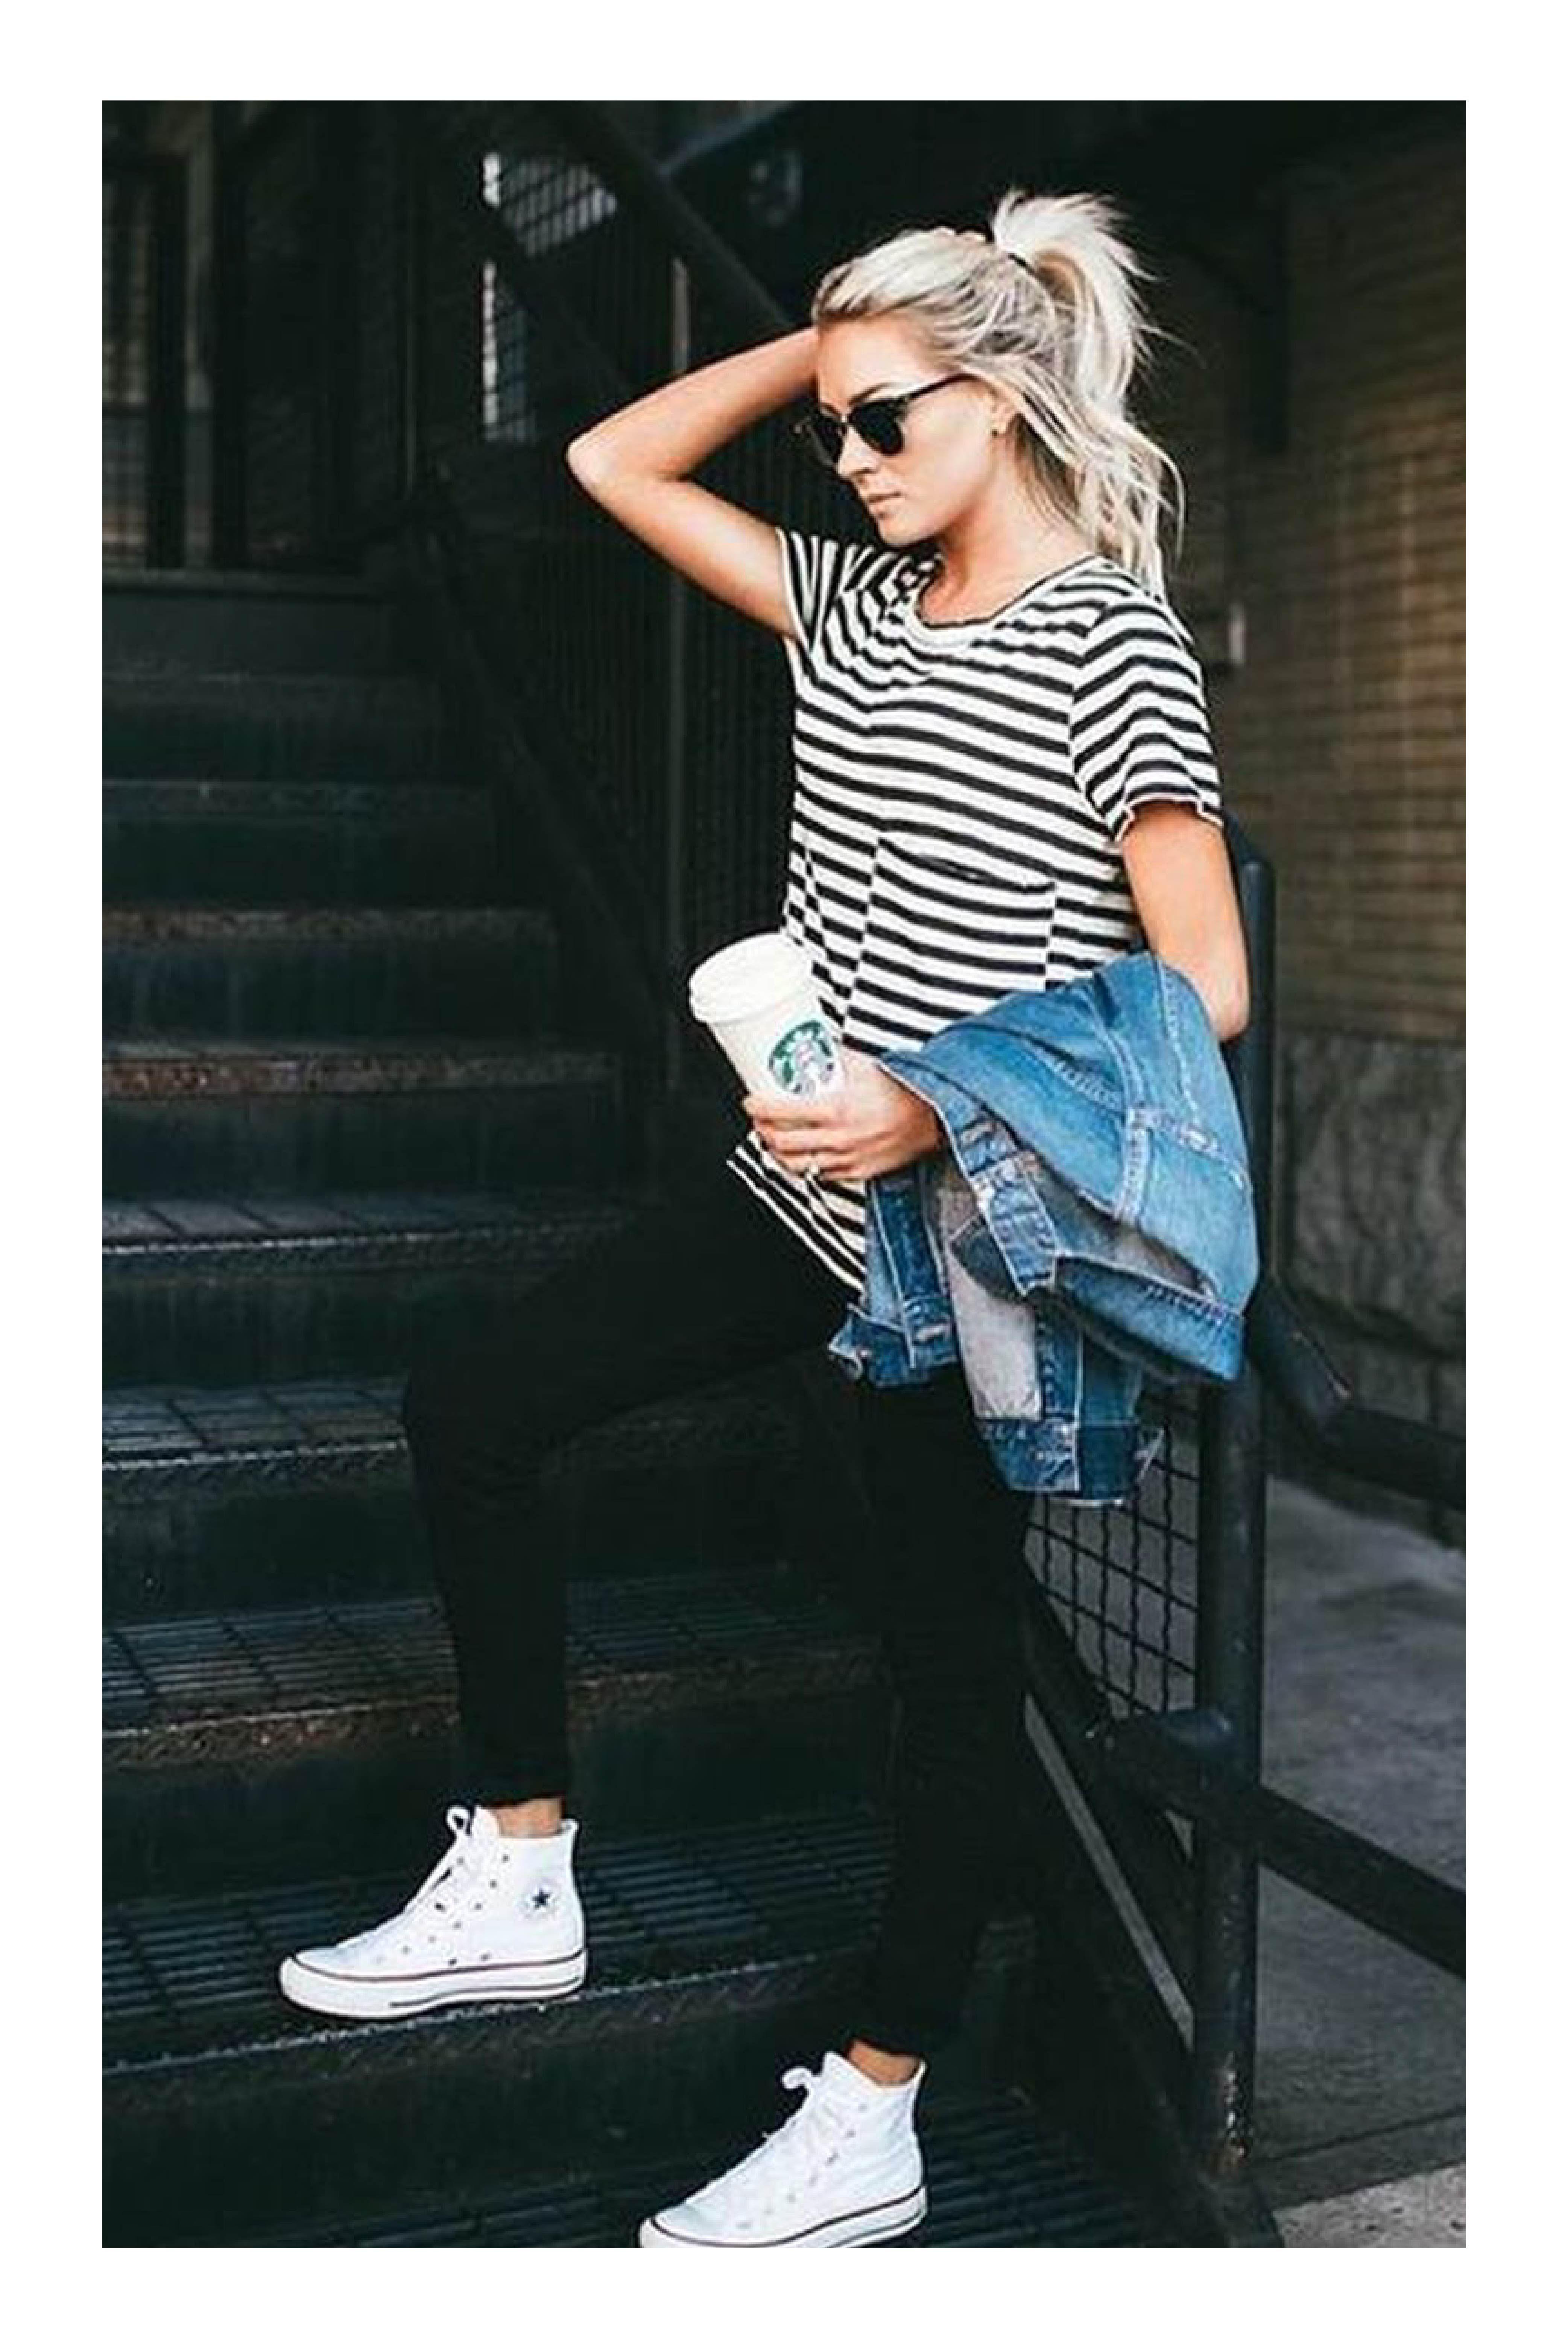 Cómo usar tus tenis blancos Tizkka | Ropa, Ropa de moda